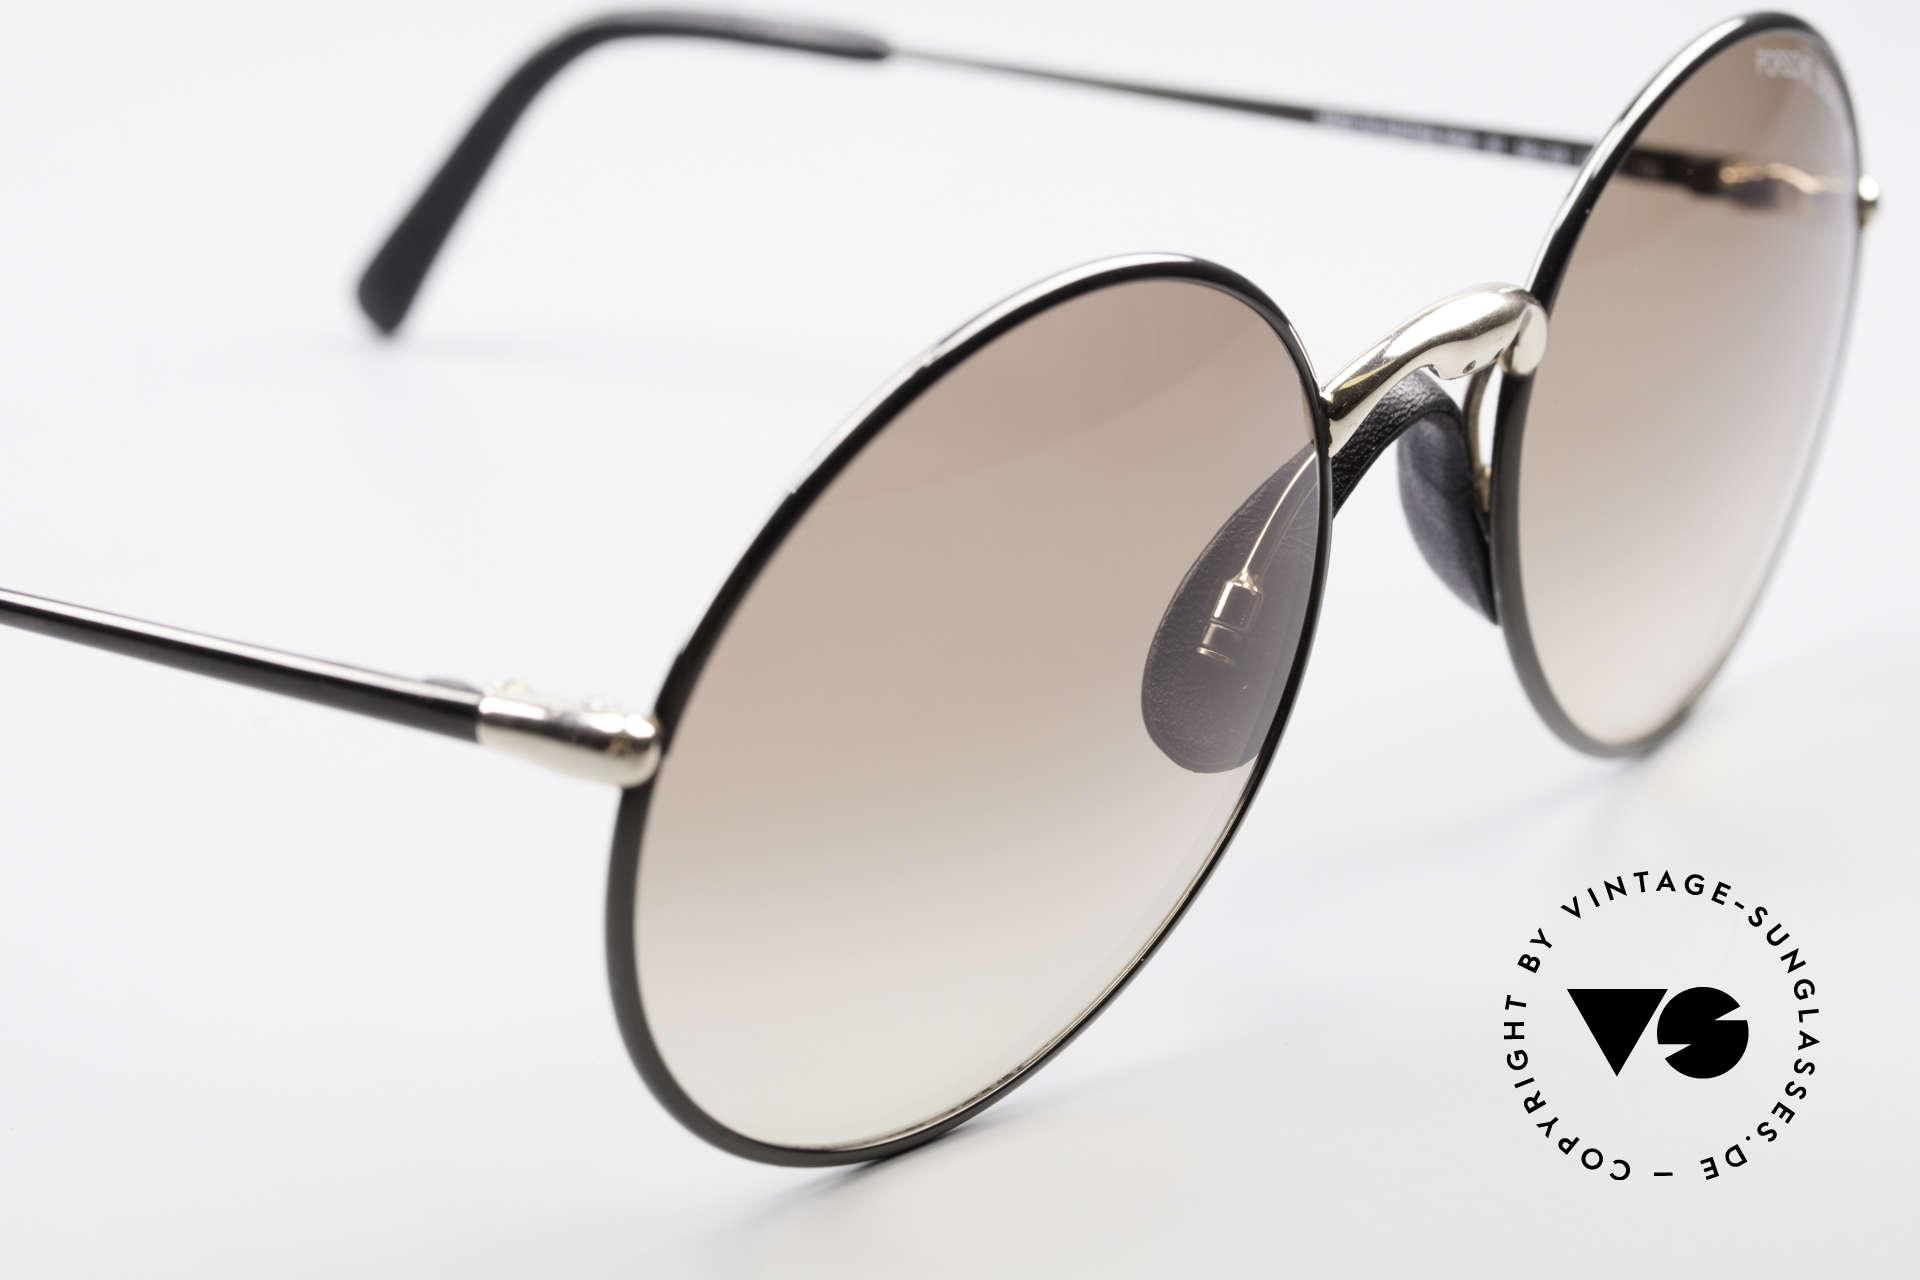 sonnenbrillen porsche 5658 vintage sonnenbrille herren vintage sunglasses. Black Bedroom Furniture Sets. Home Design Ideas